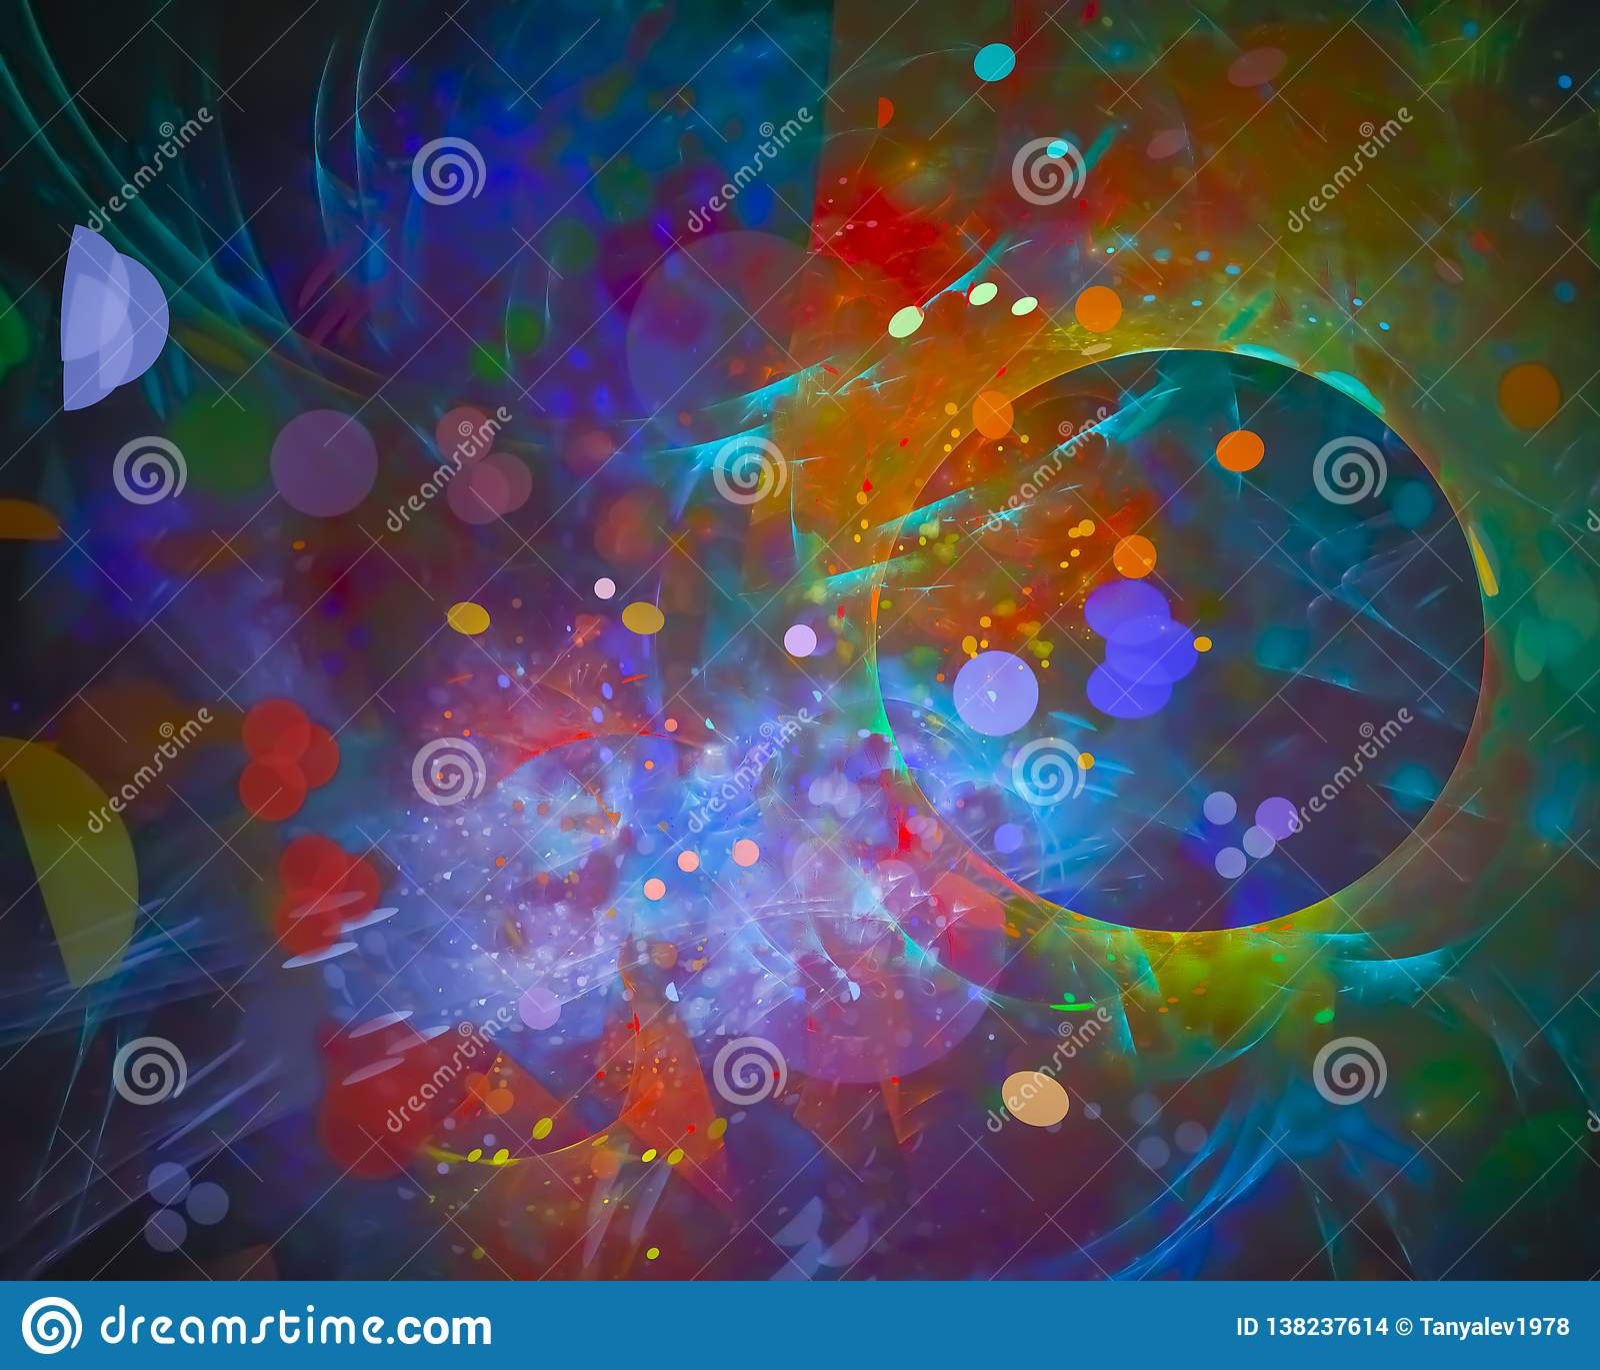 Abstract Digital Fractal Power Motion Flow Wallpaper Texture